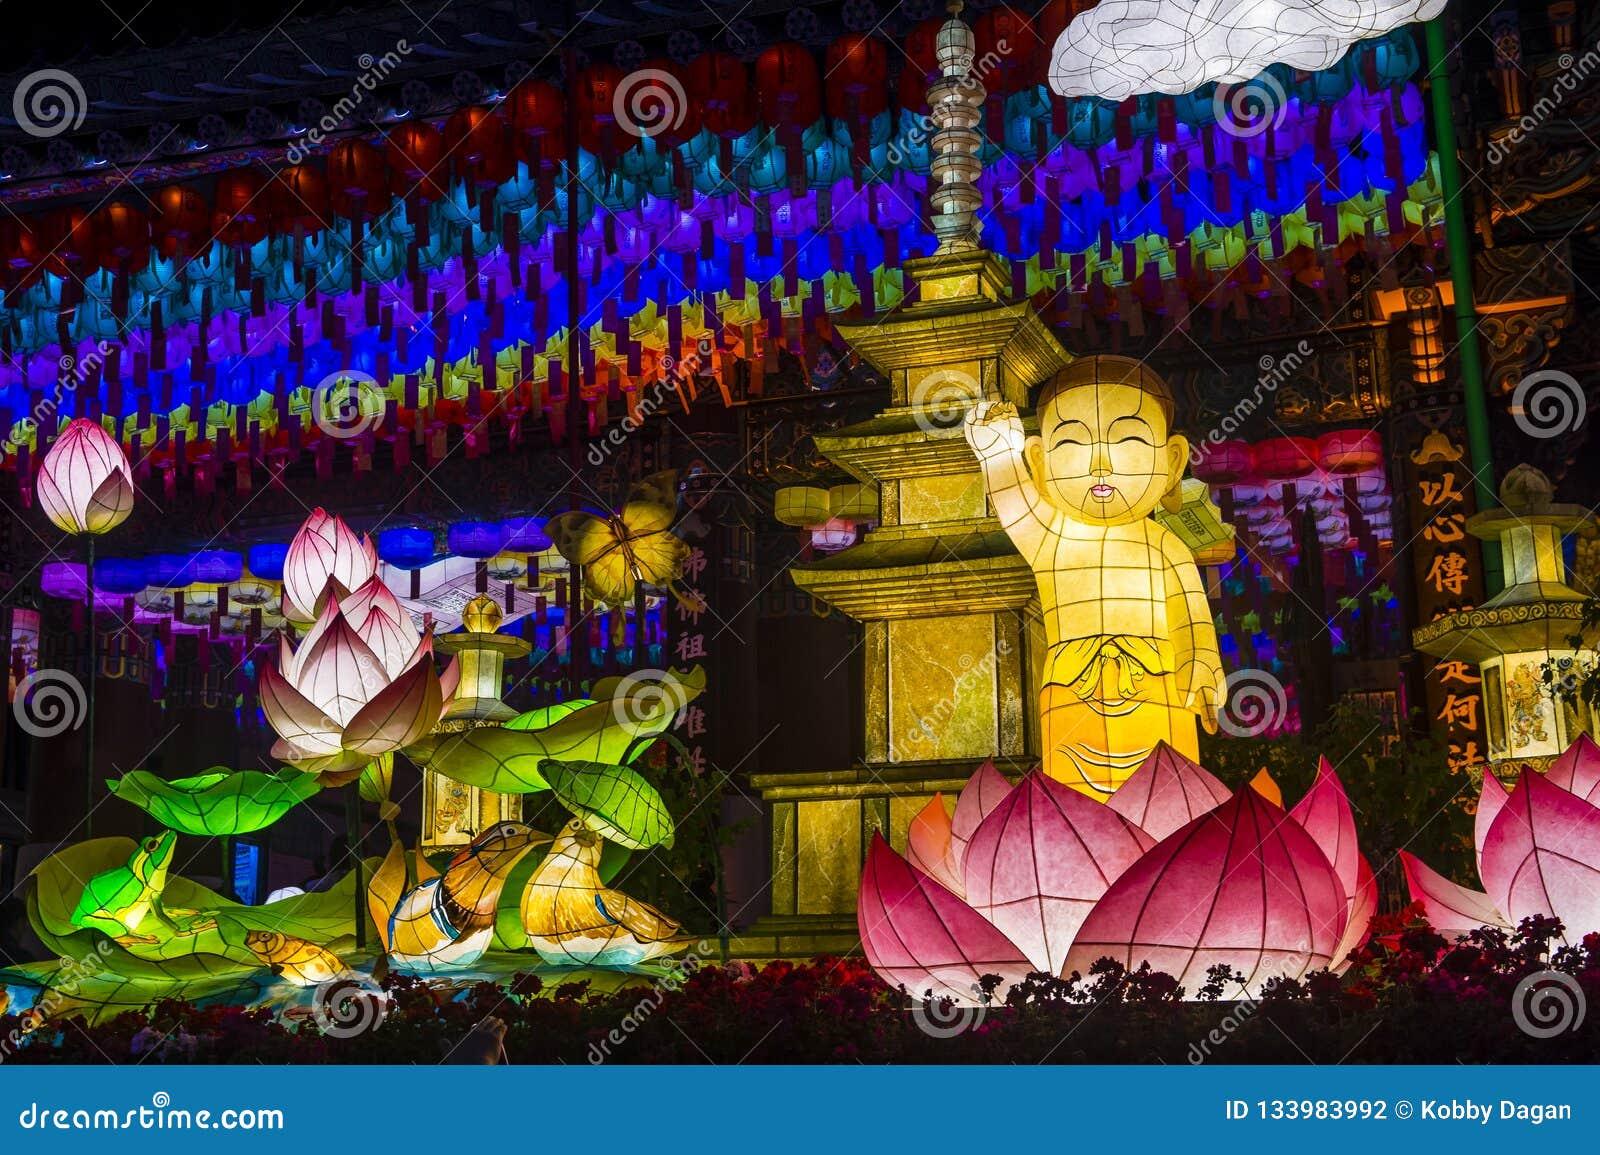 Seoul Lotus Lantern Festival Editorial Photography Image Of Asia Deung 133983992